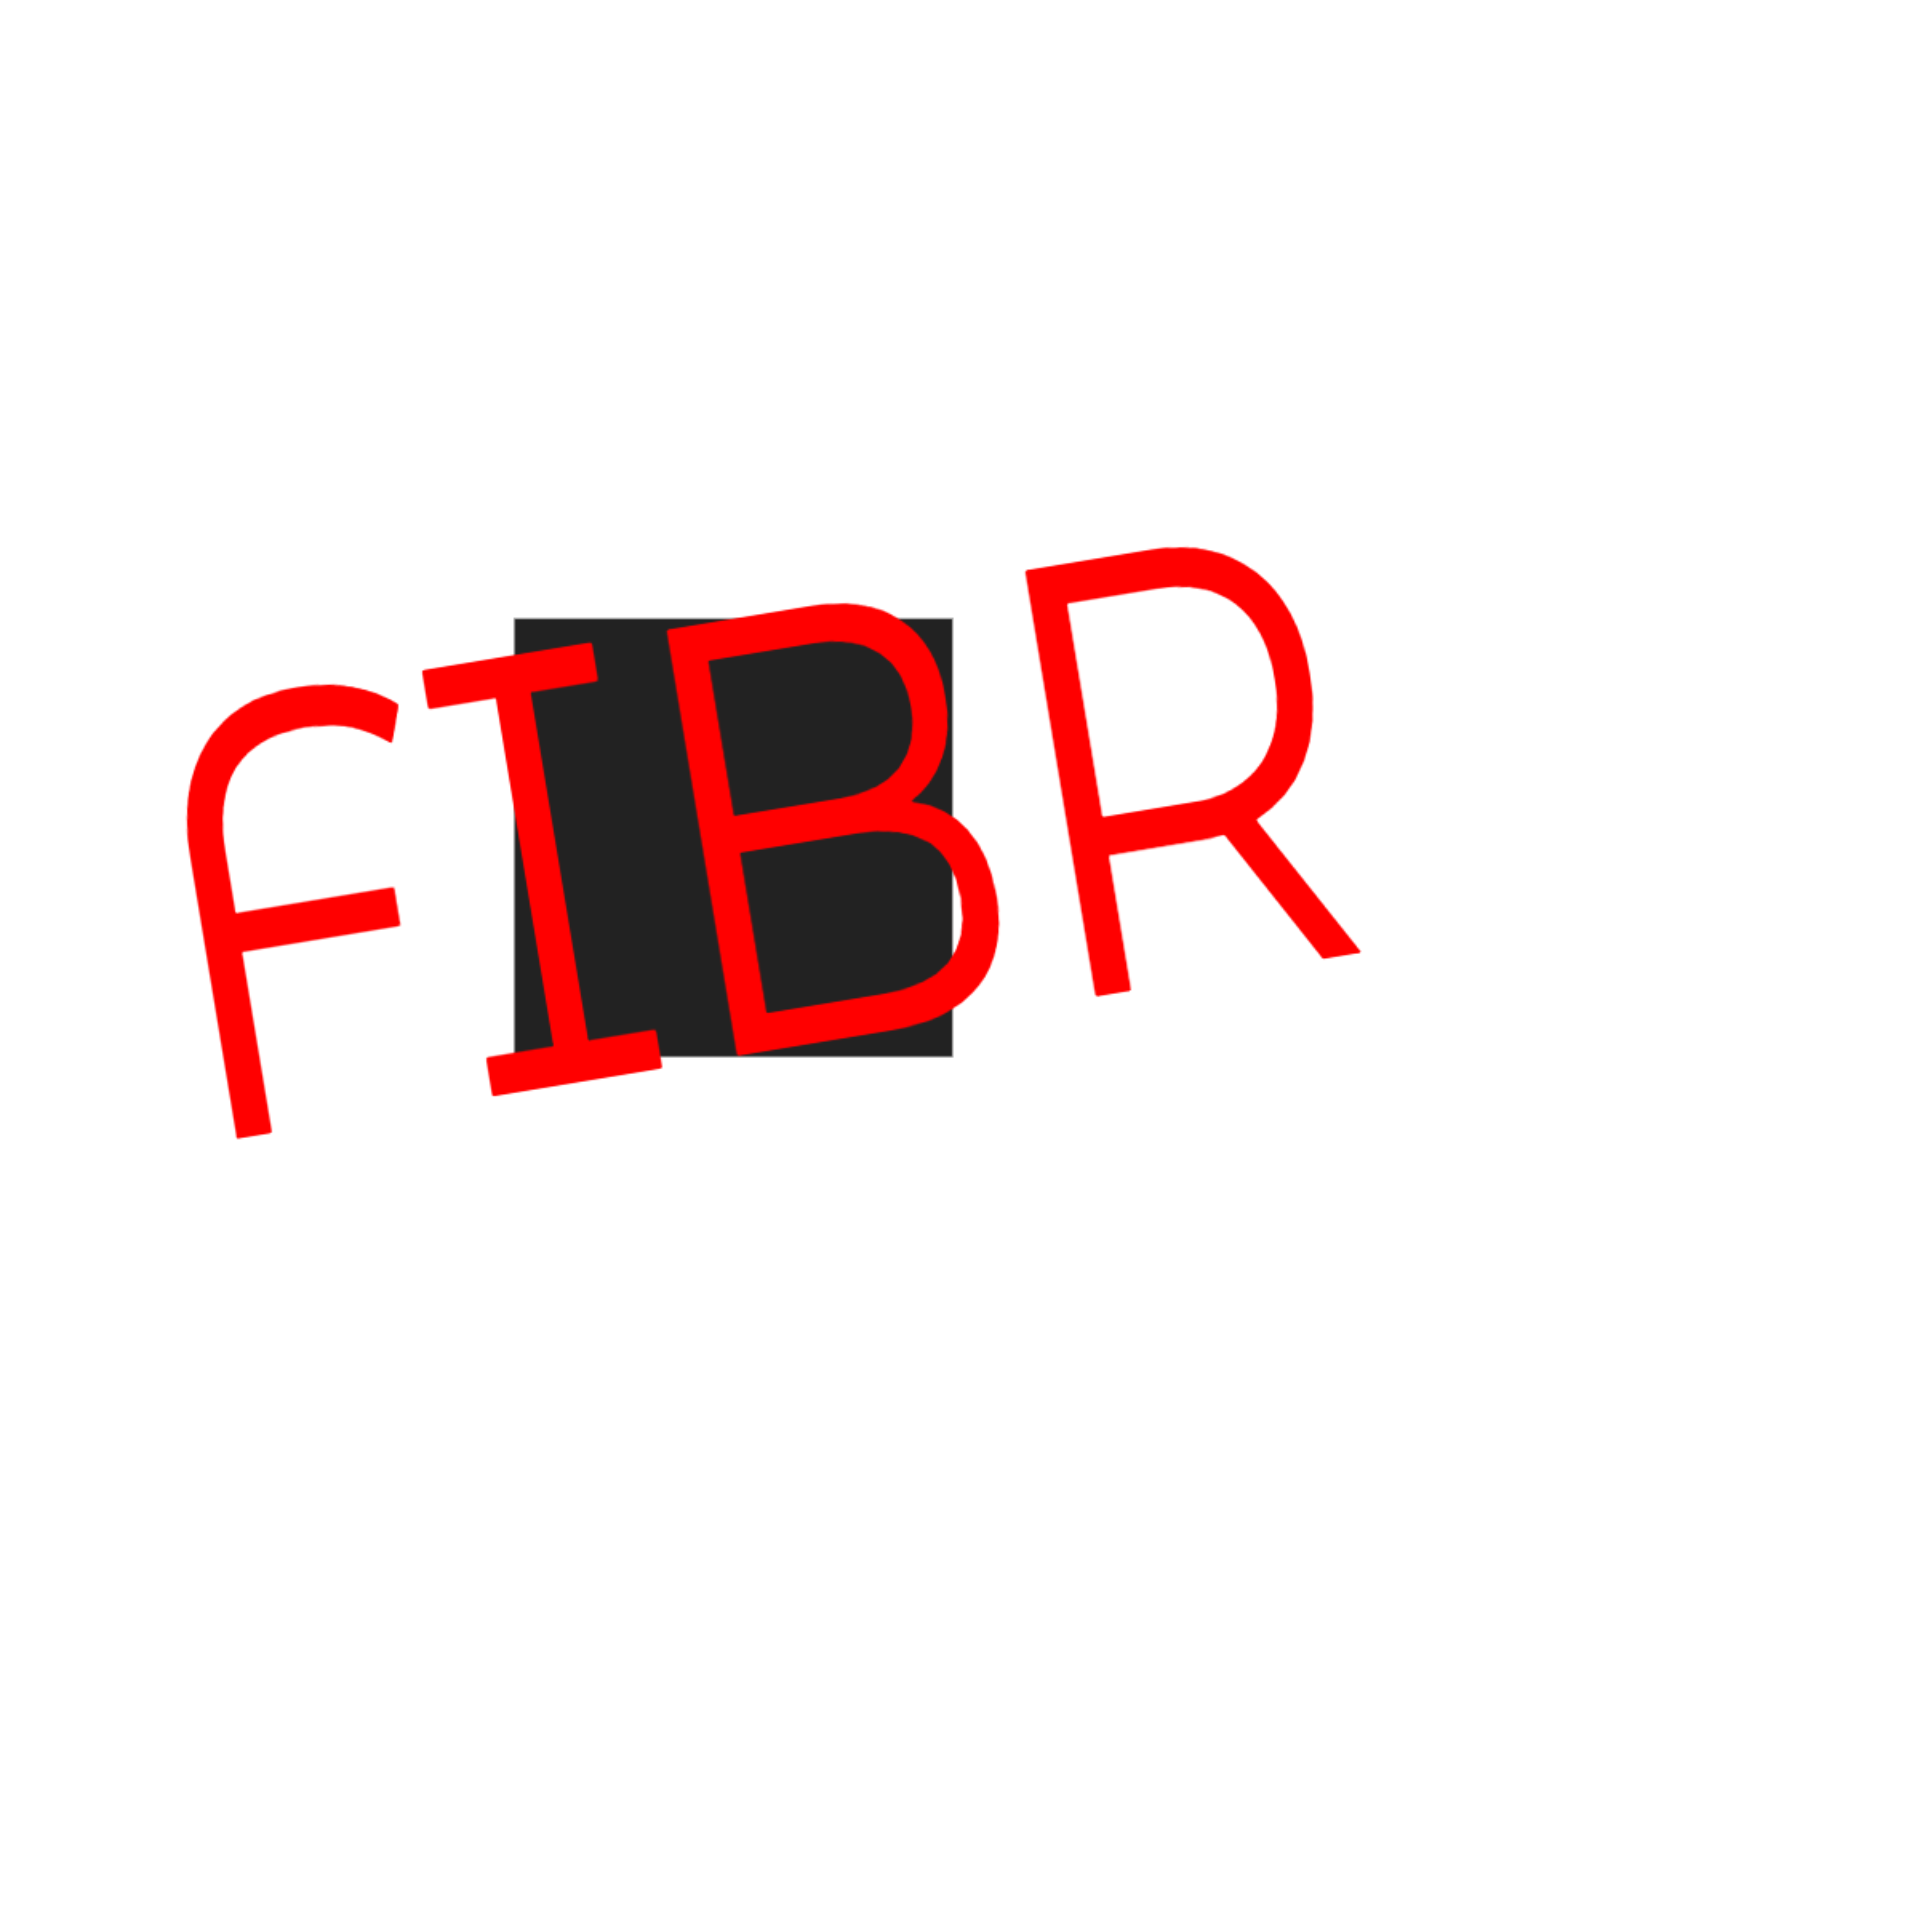 logo720201821244772602 (1)